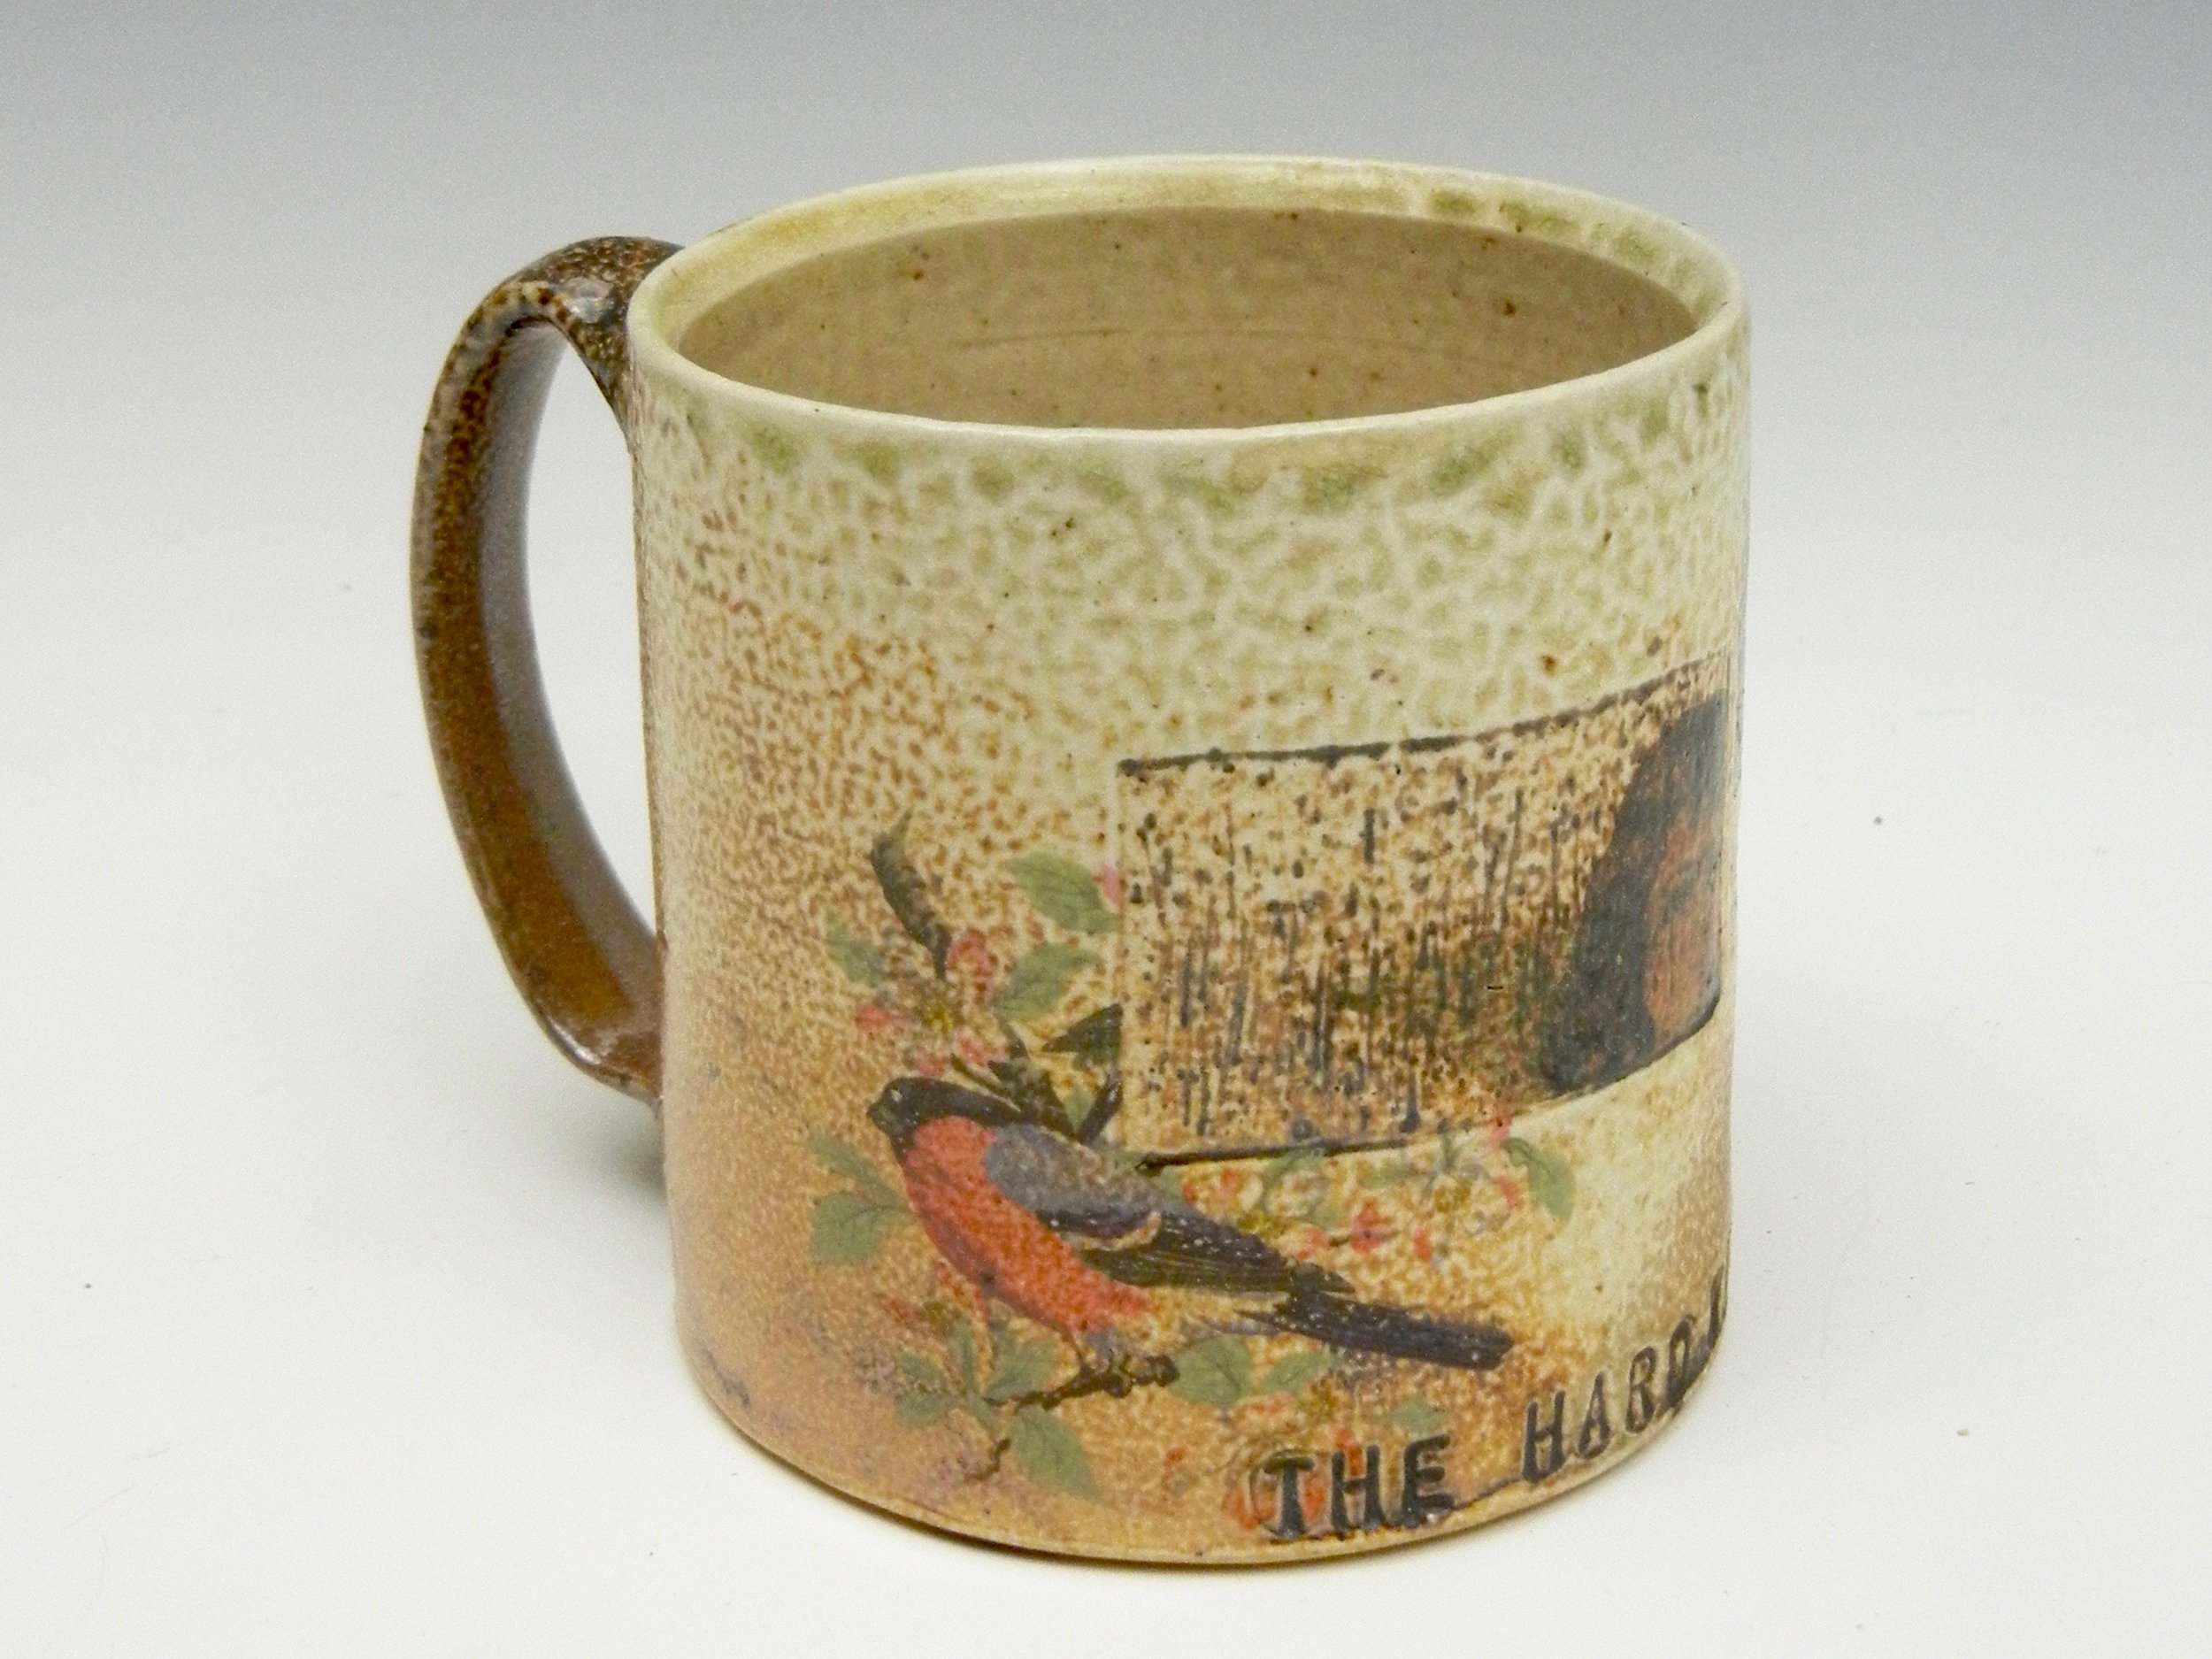 Lorenz Pottery, handmade, ceramics, pottery, folk pottery, wood fired, soda fired, coffee, mug